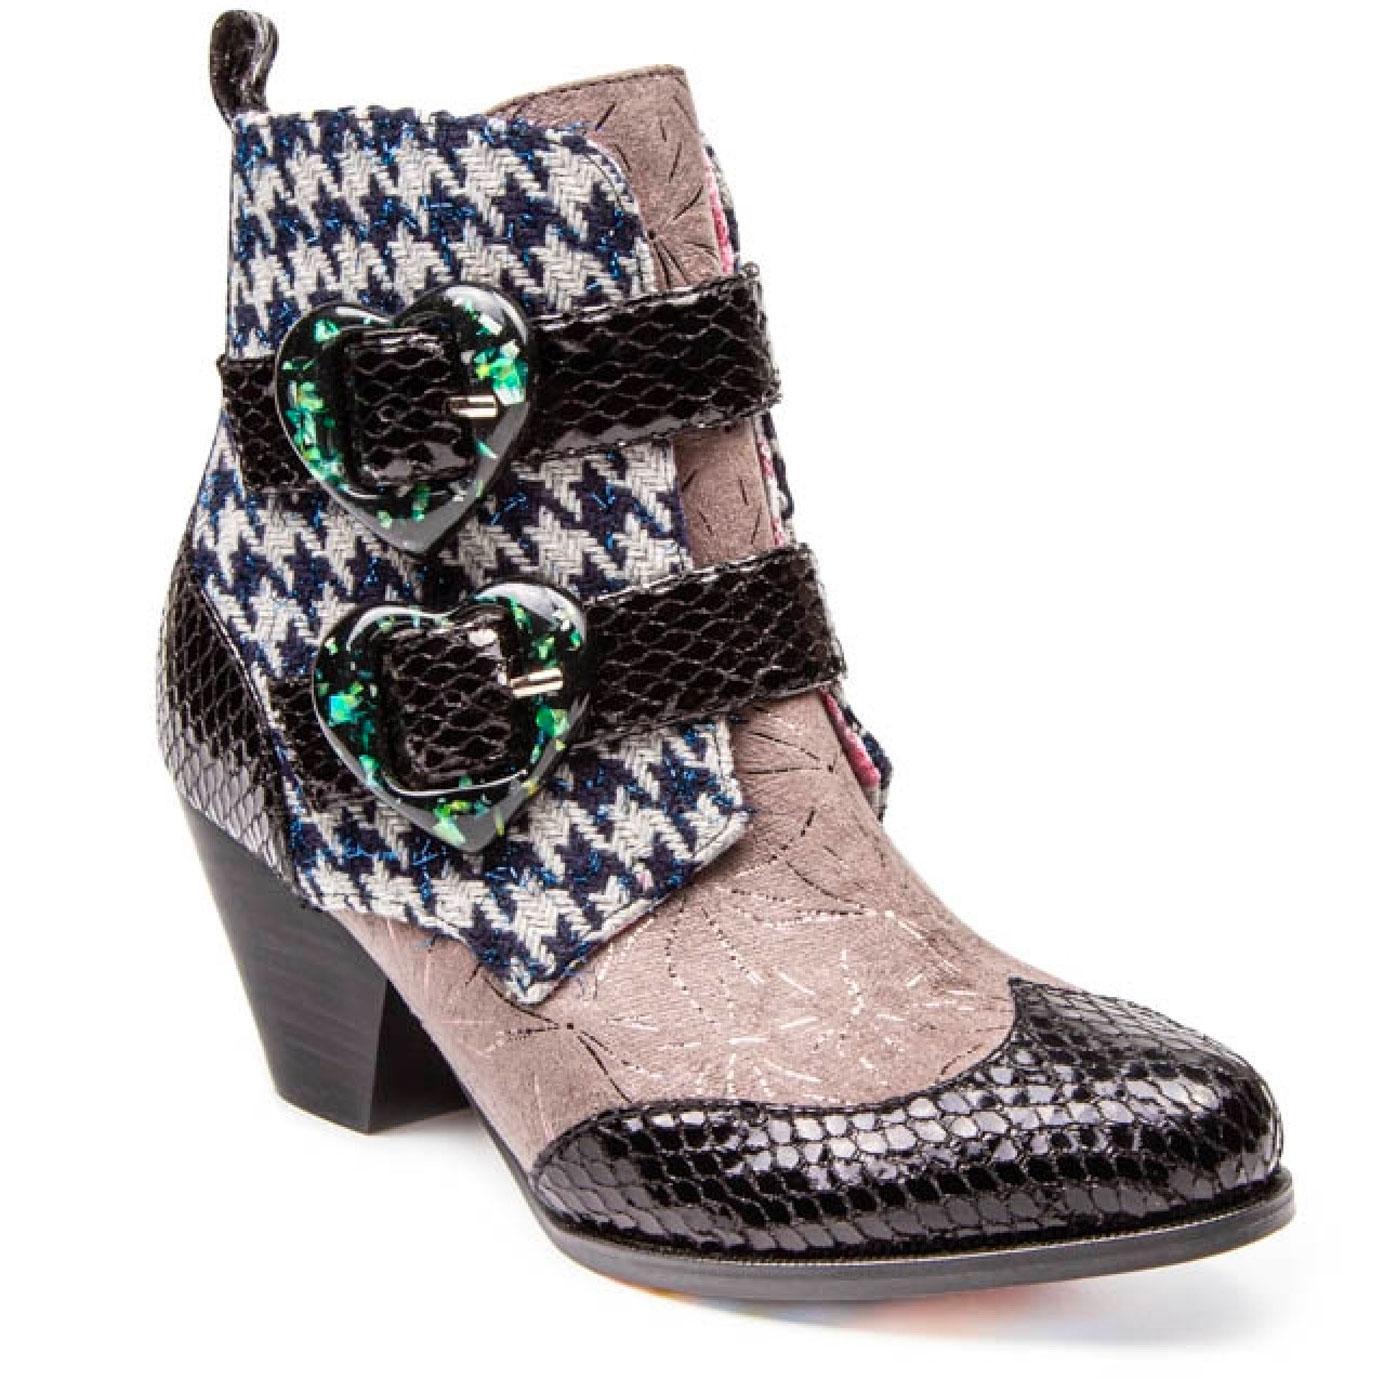 Too Hearts IRREGULAR CHOICE Mod Dogtooth Boots